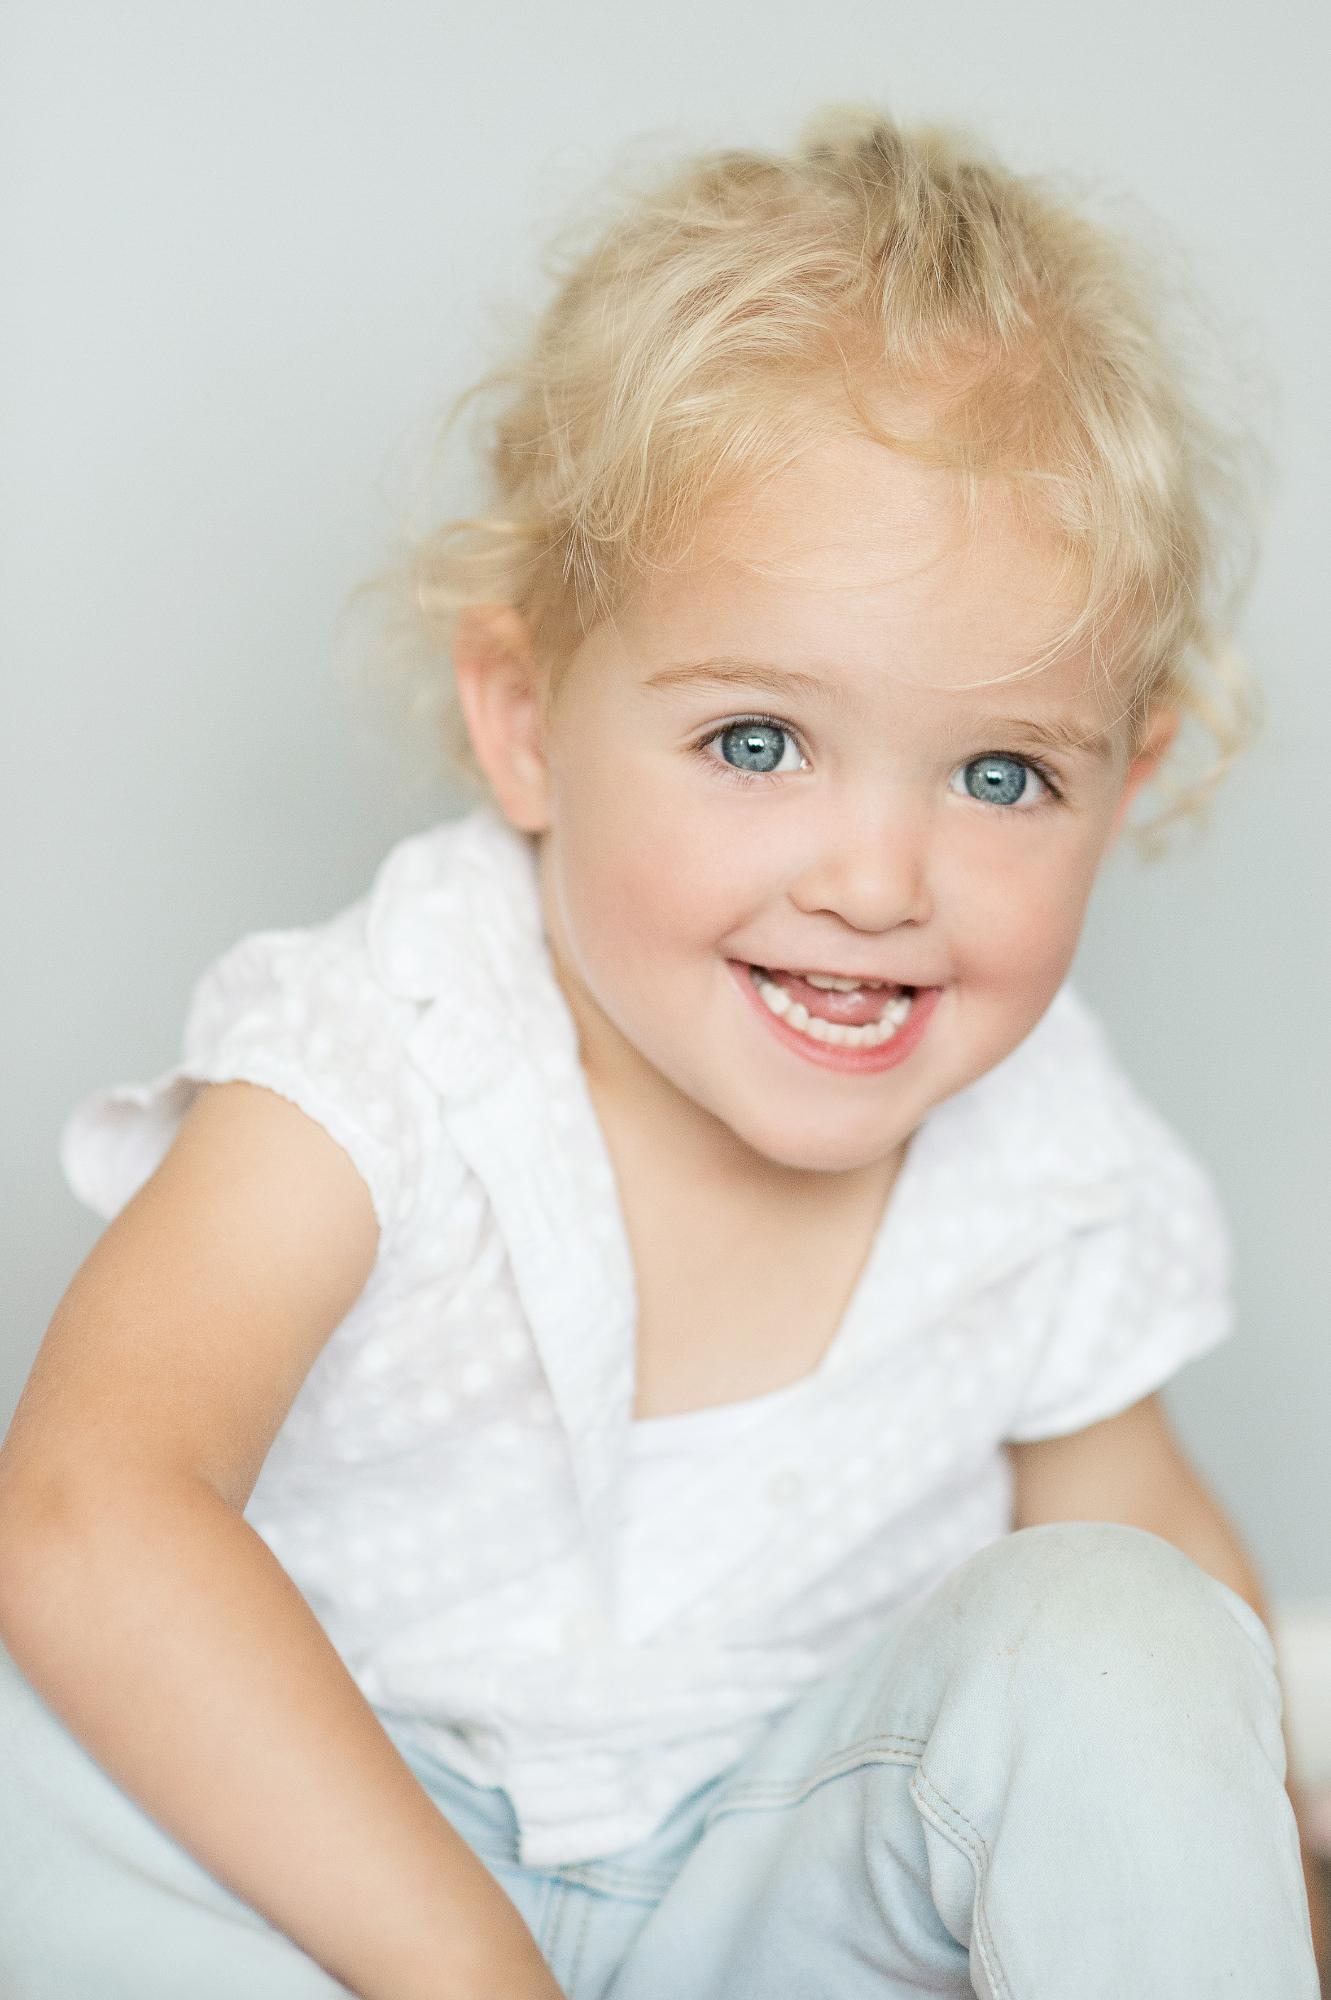 Naturelle Look Photography - Lifestyle Family_Newbornshoot b001.jpg